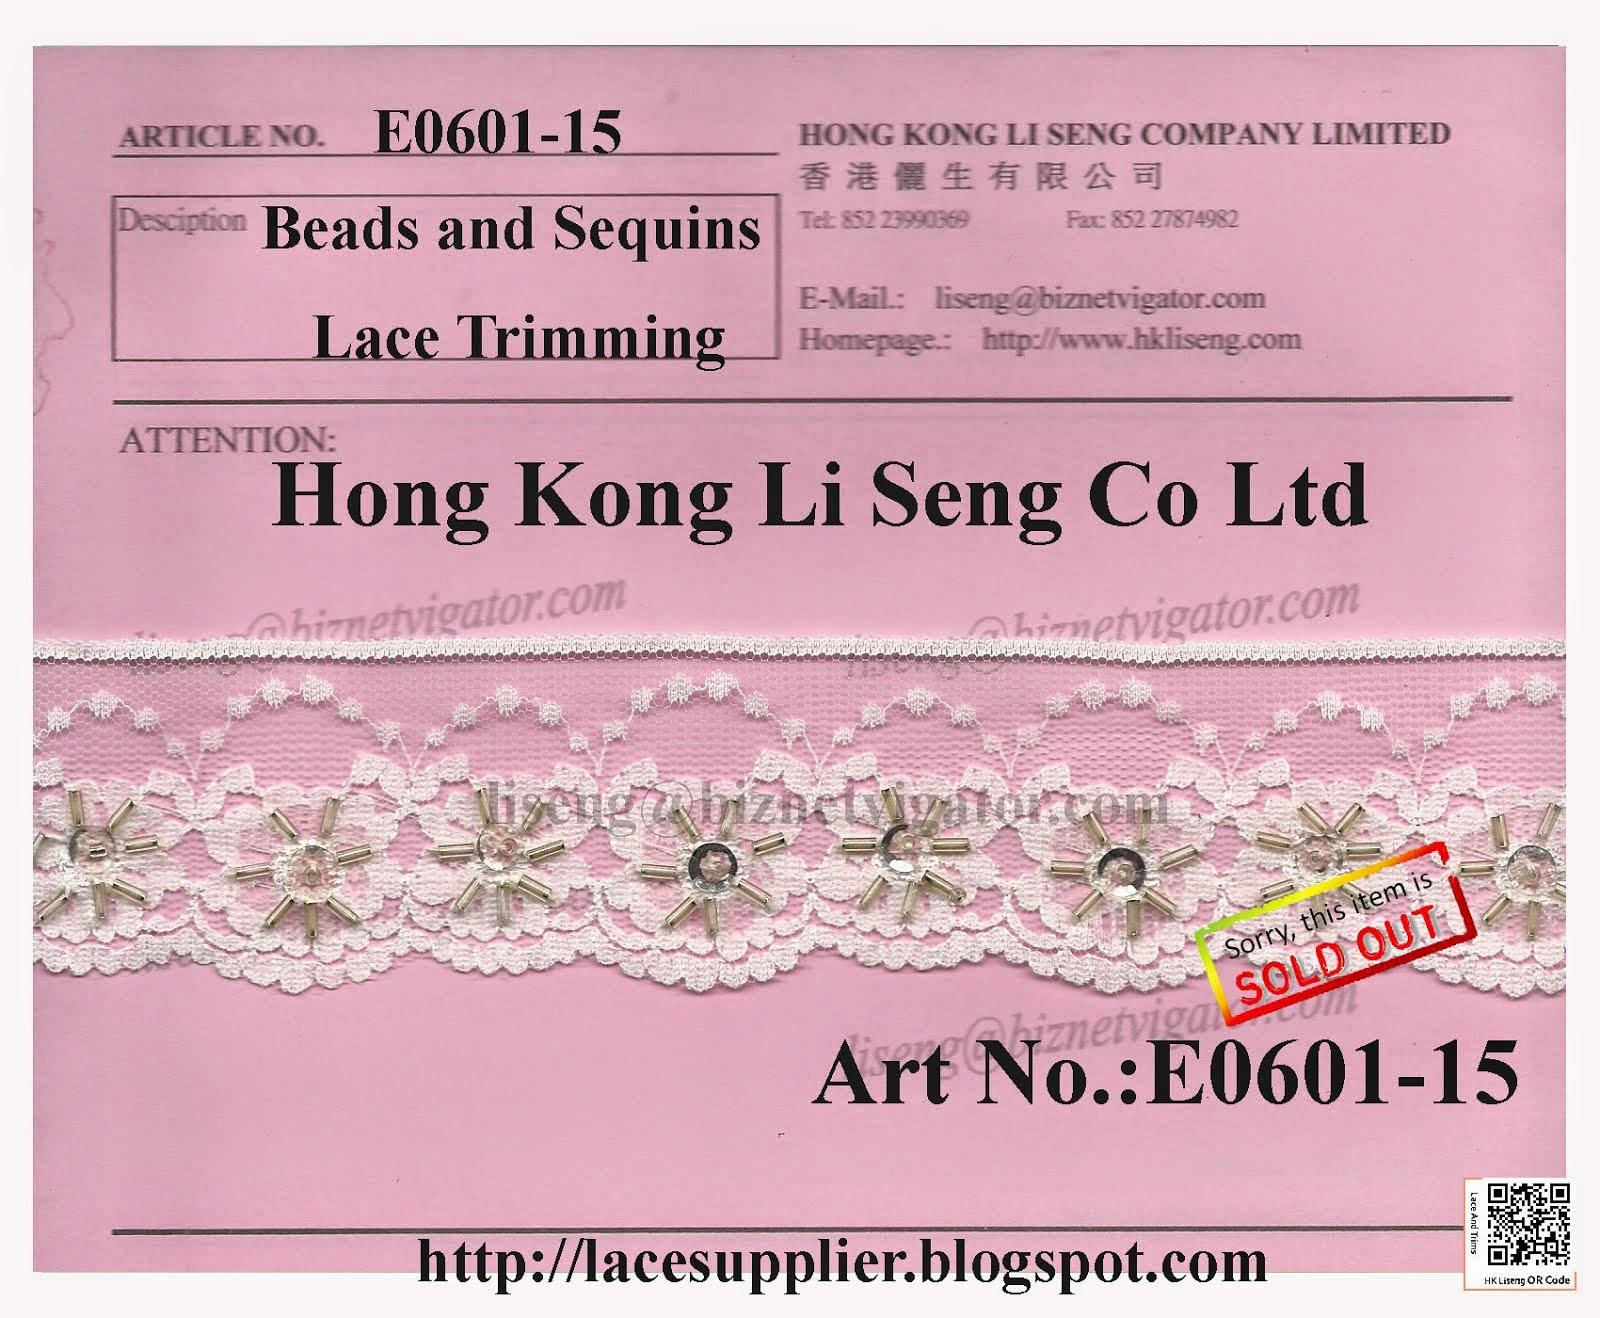 Beads and Sequins Lace Trimming Factory - Hong Kong Li Seng Co Ltd